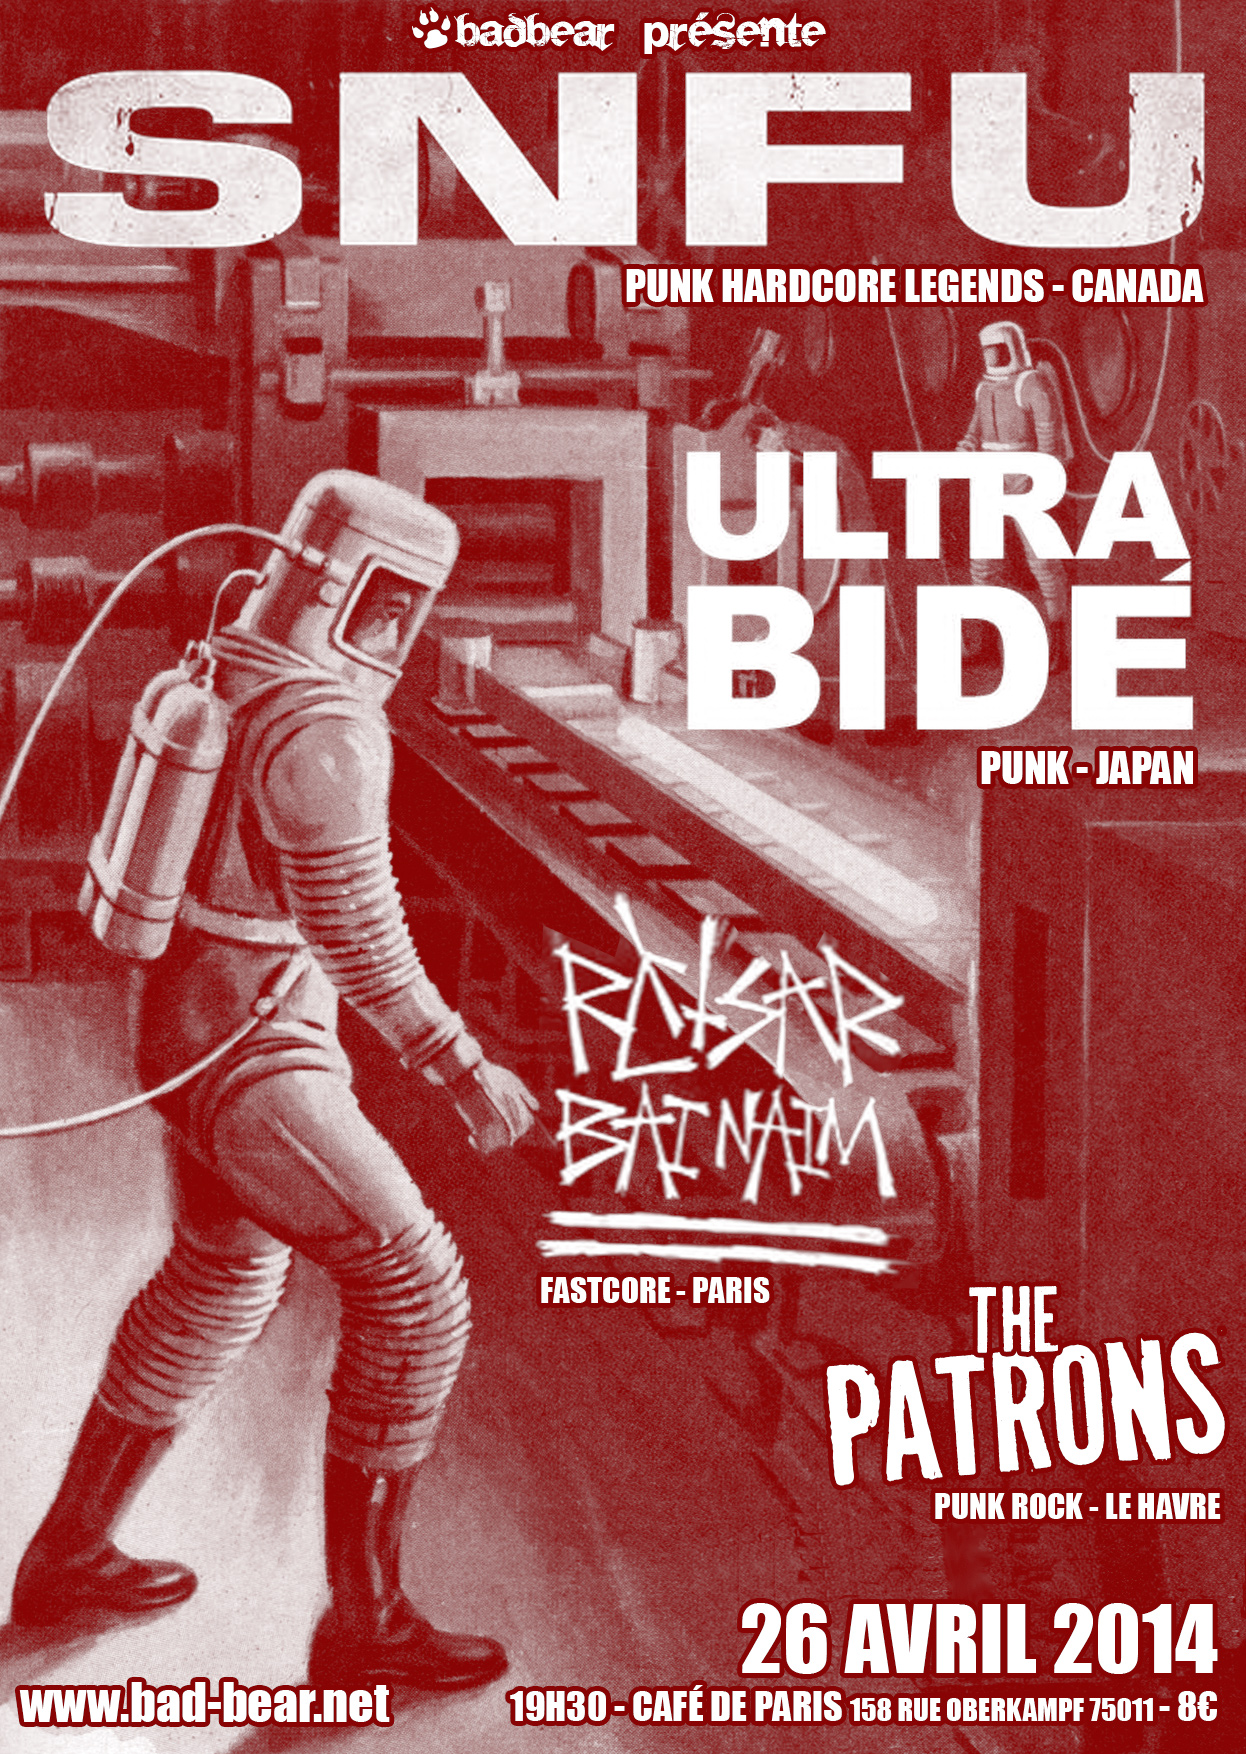 26/04-2014 - SNFU + Ultra Bide + Retsar Bai Naim + The Patrons